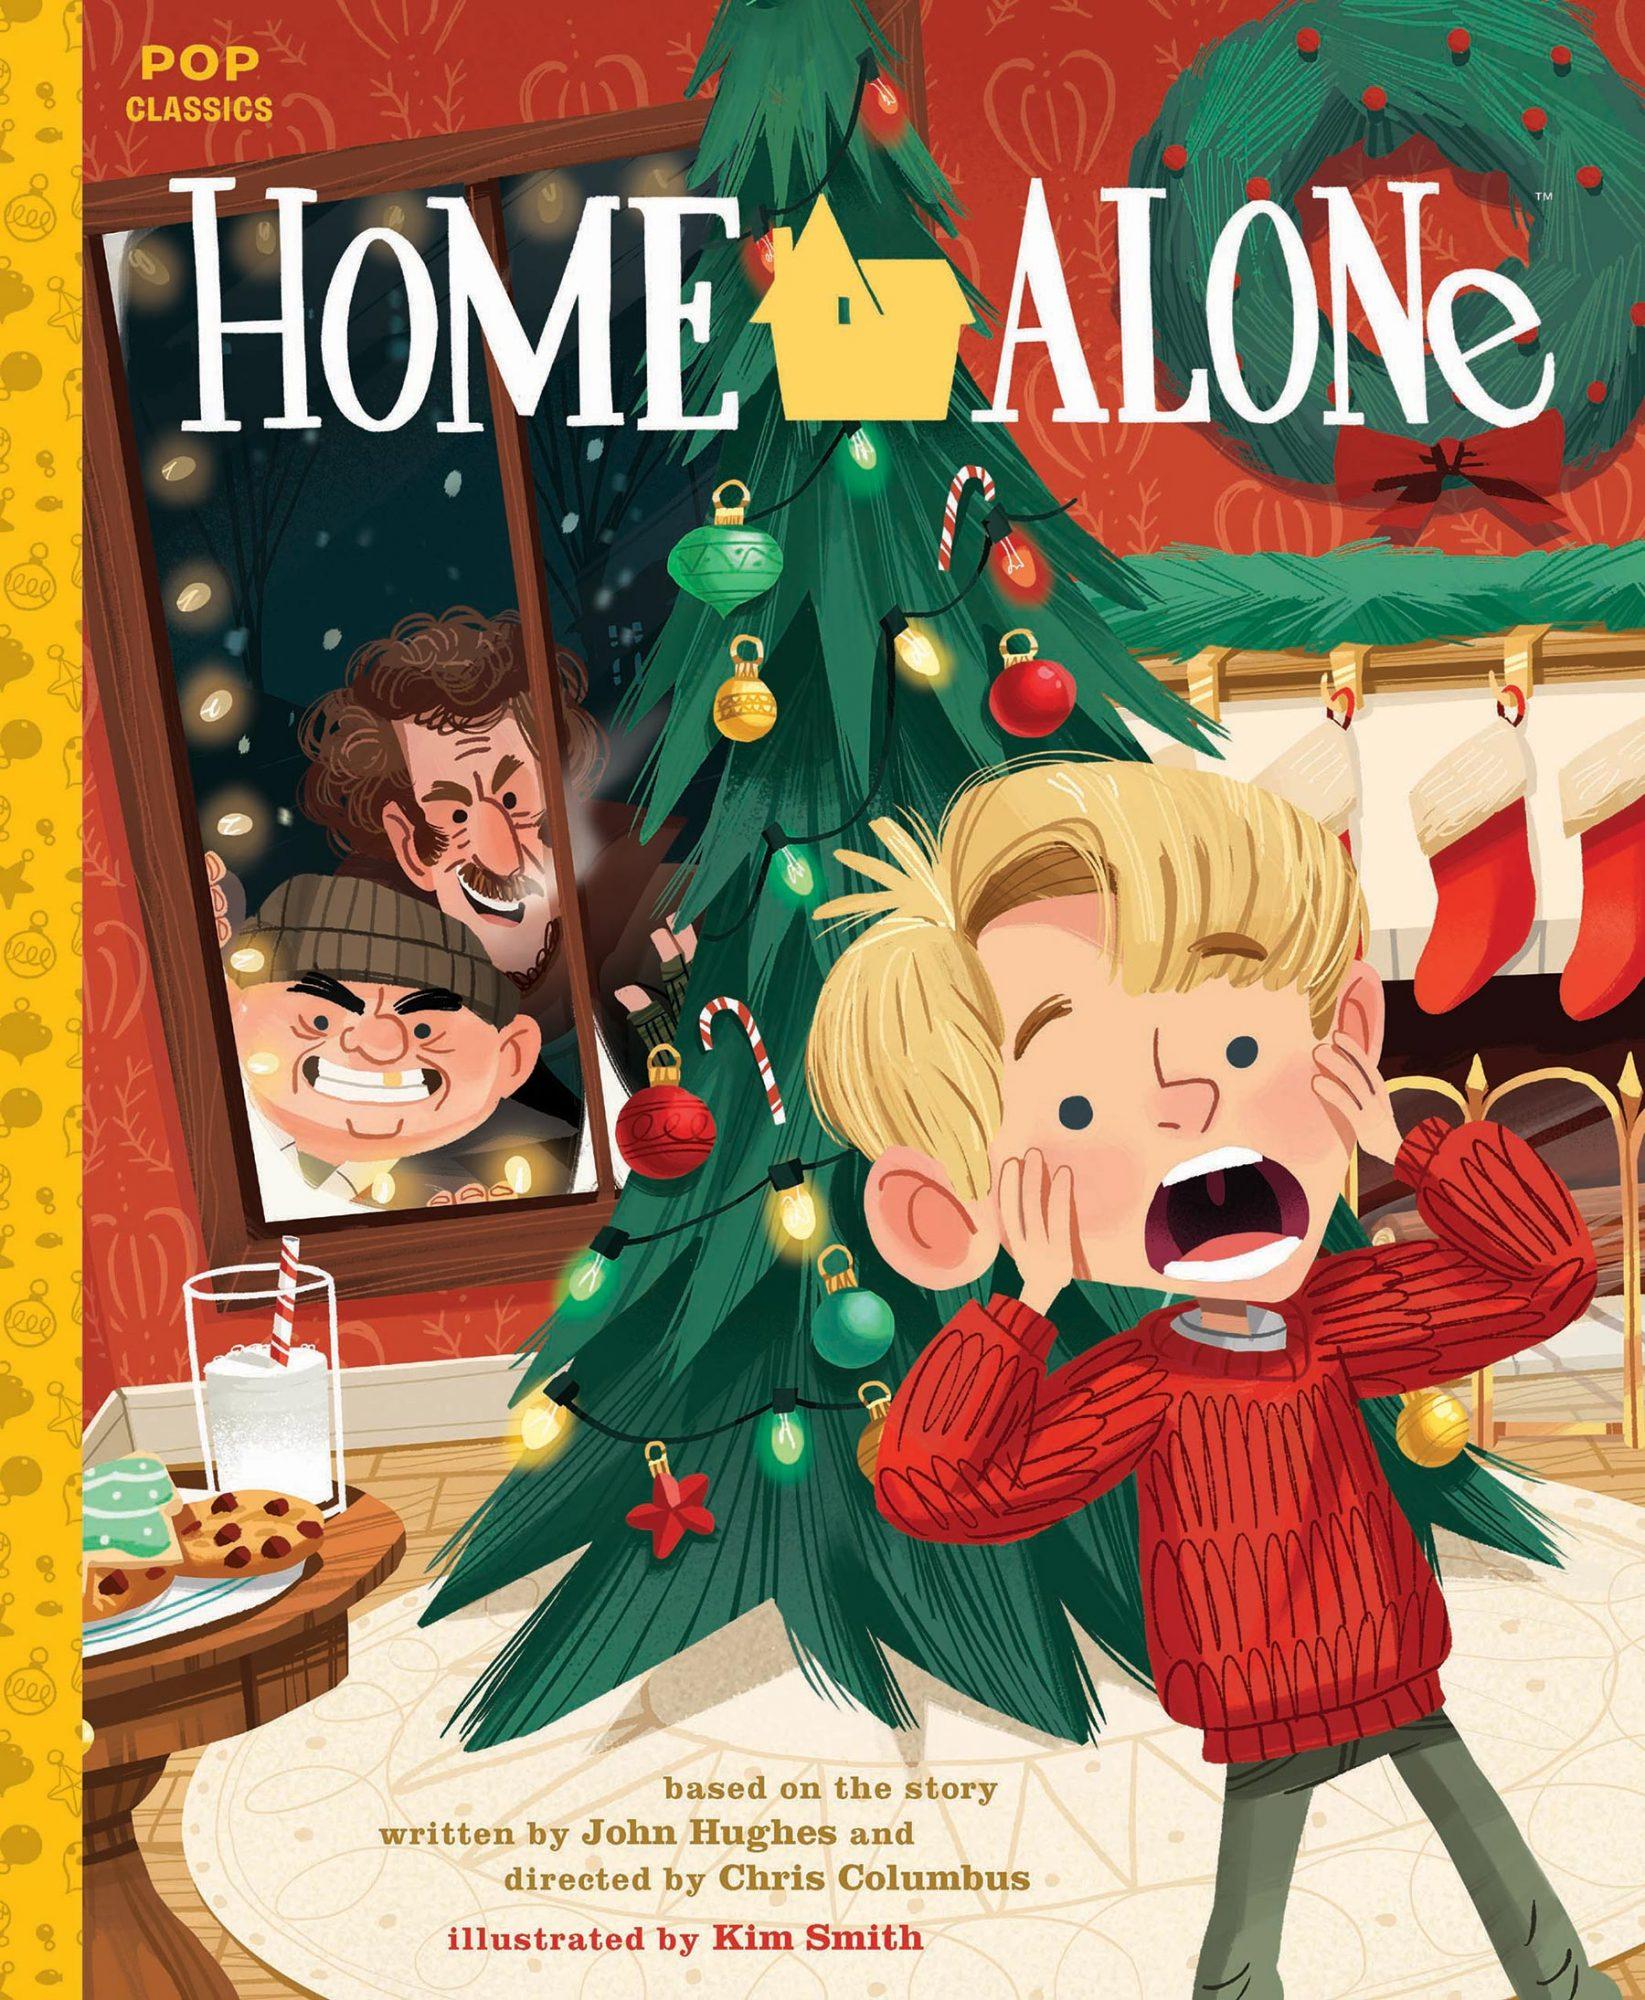 HomeAlone_pop-classic_Quirk-Books